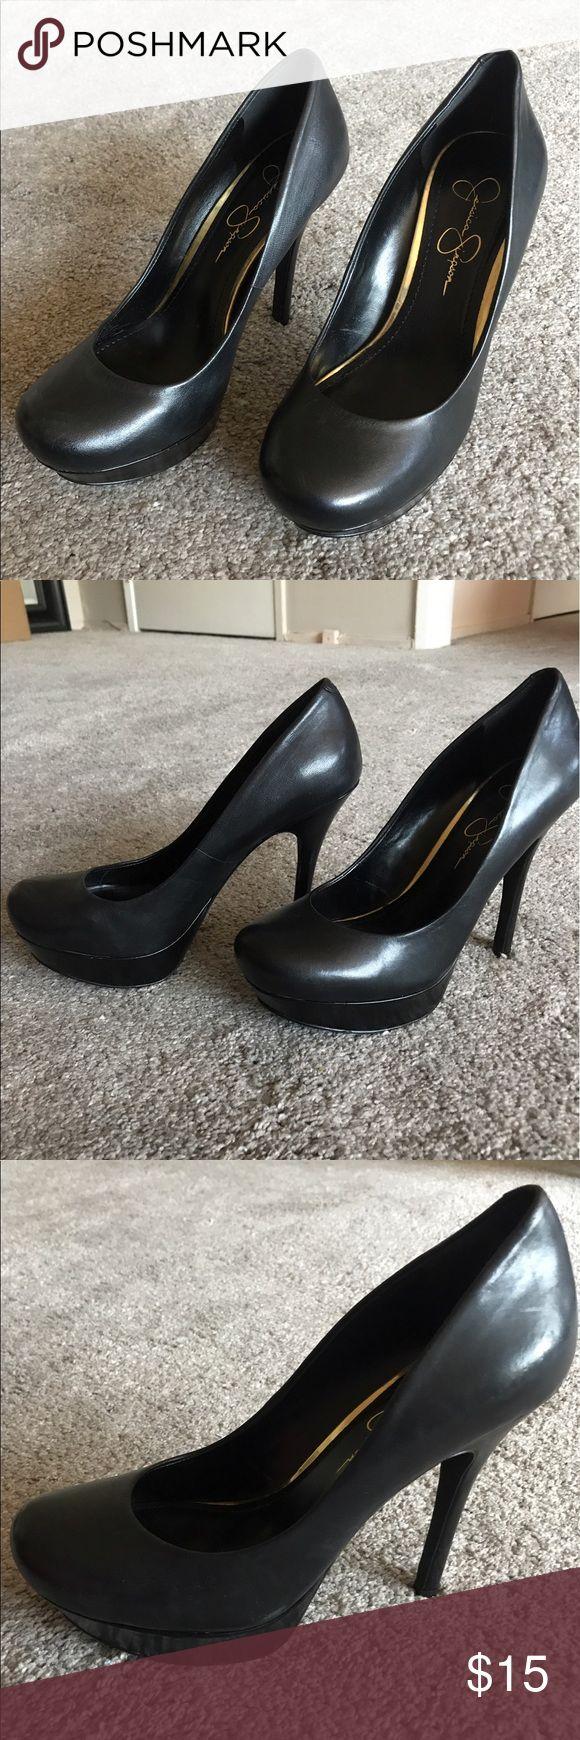 Jessica Simpson Black Pumps Platform pump, rounded toe. Worn outside once. Jessica Simpson Shoes Heels